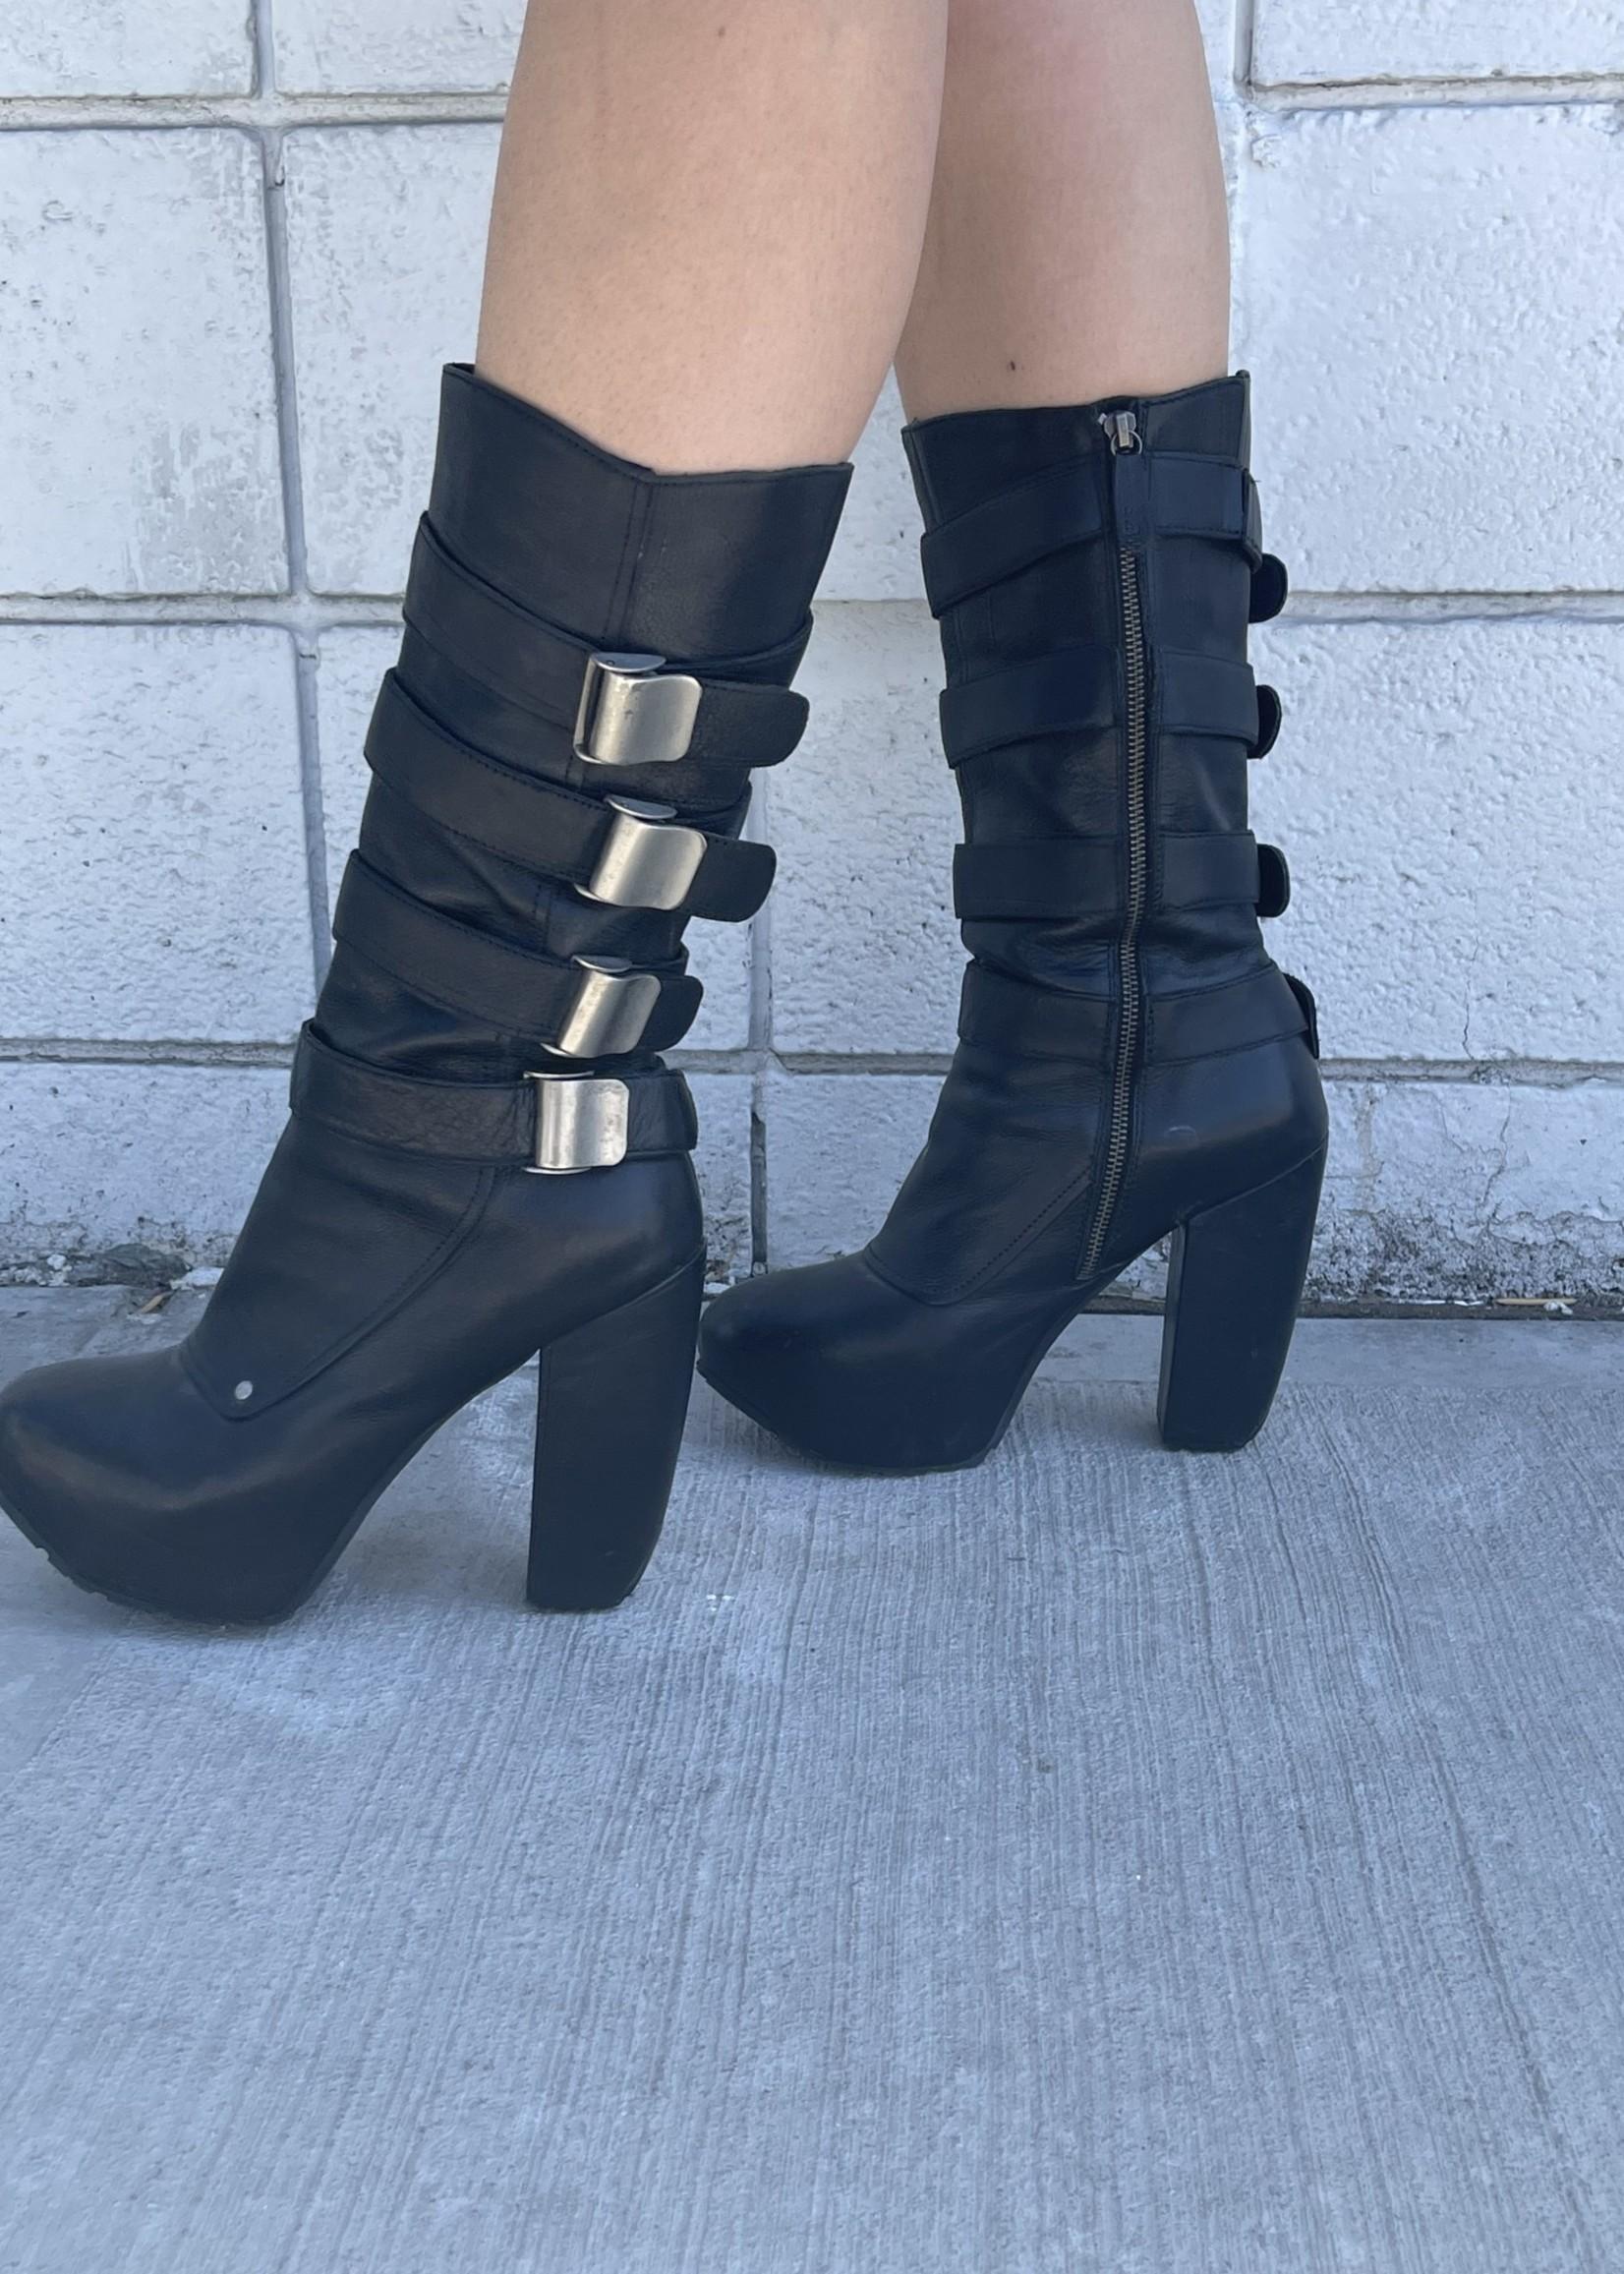 Miista Black Platform Heeled Boots 10